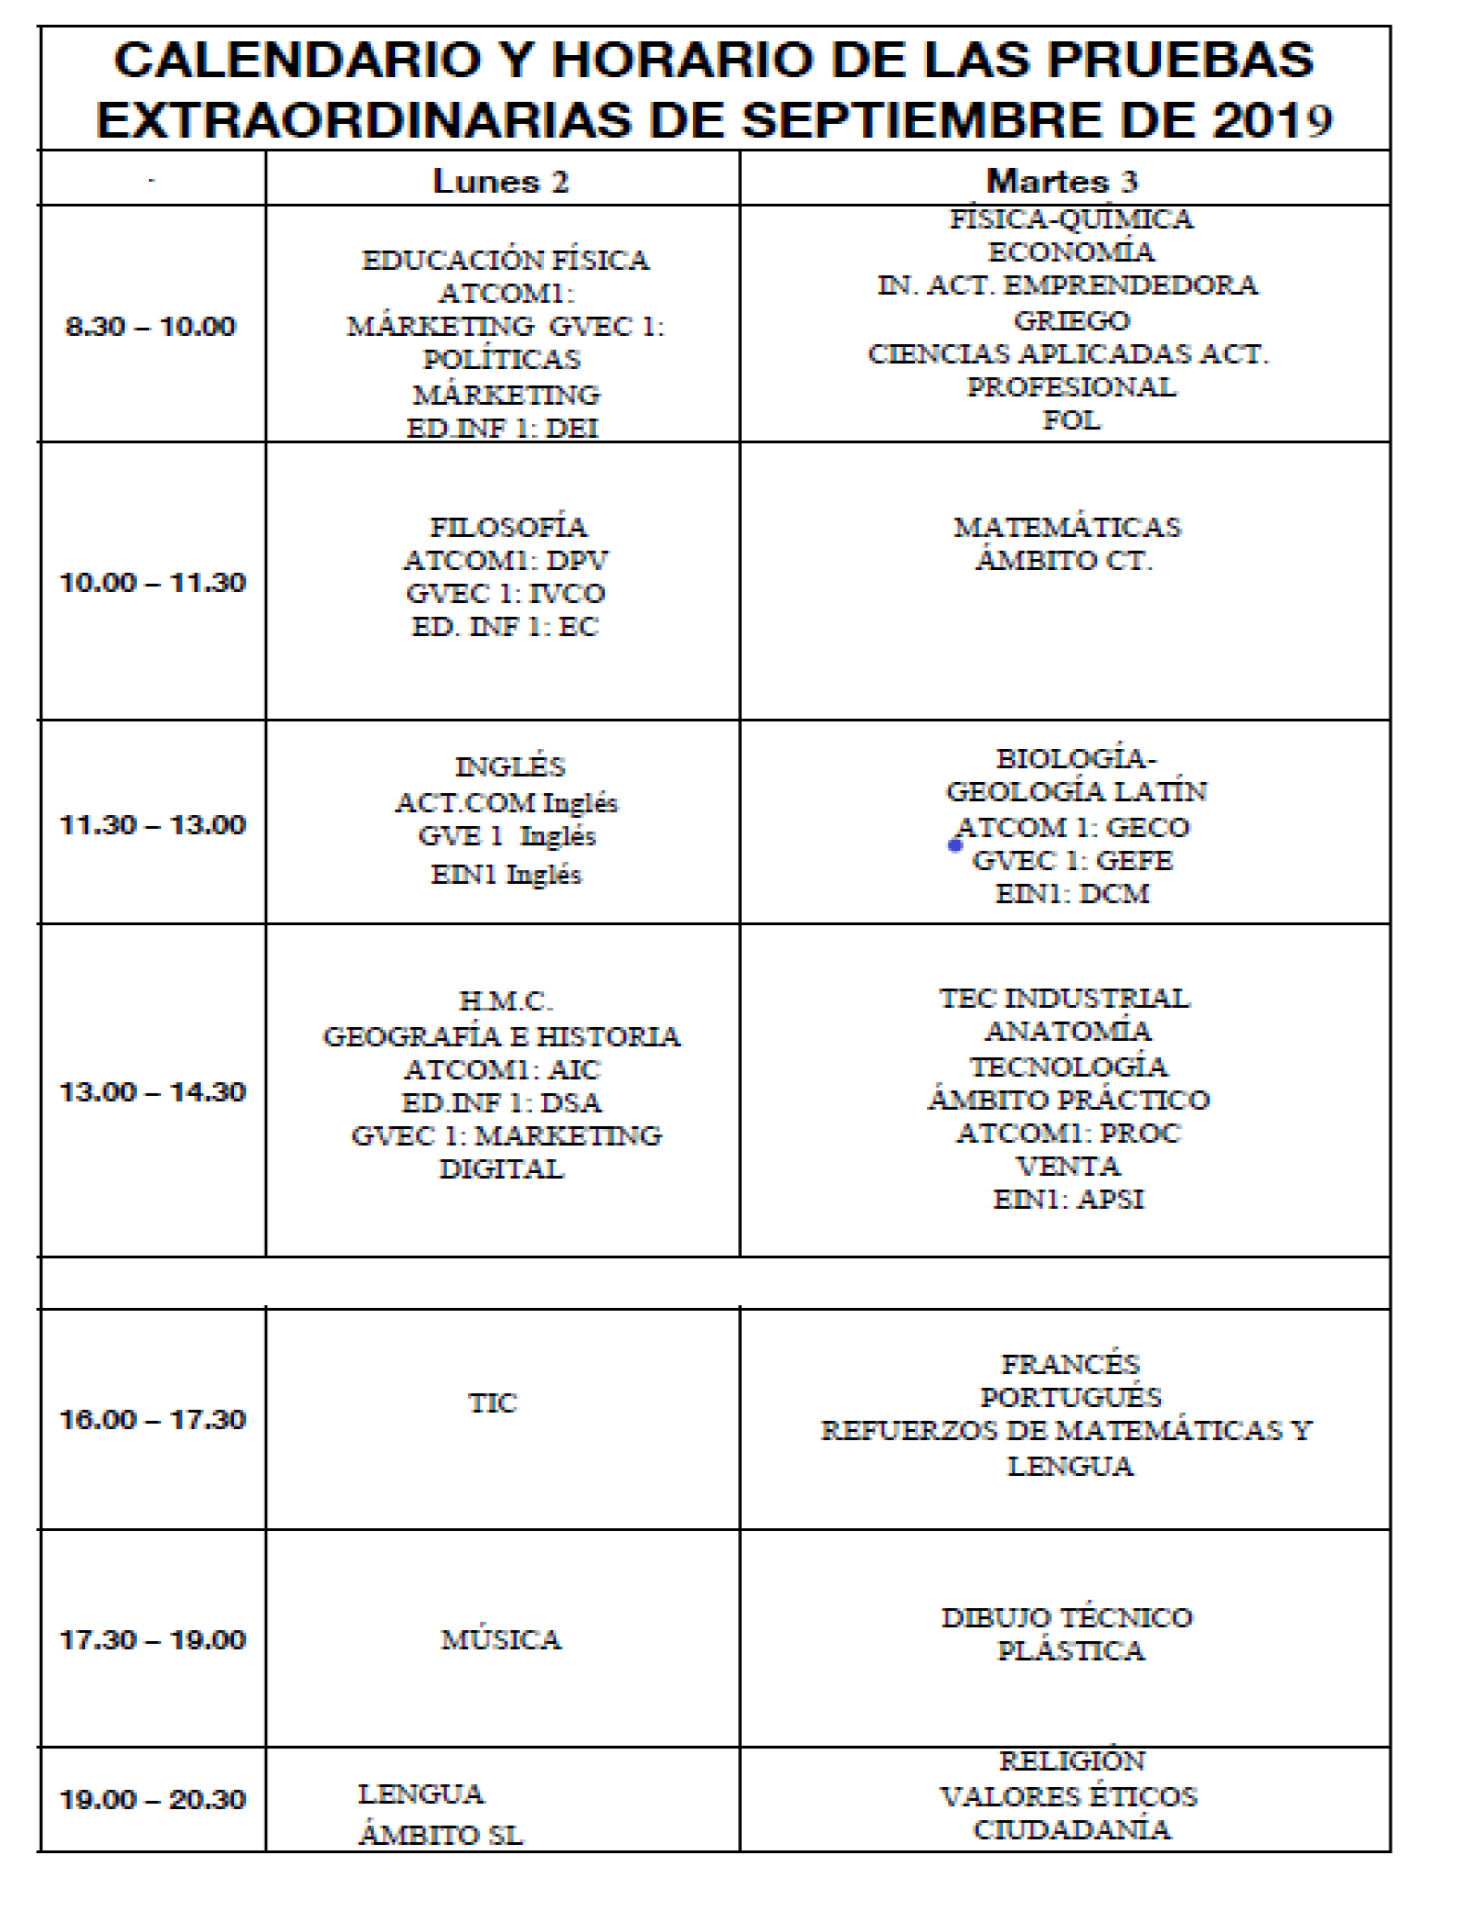 Calendario De Agosto Y Septiembre 2019.Calendario Examenes Septiembre 2019 I E S Pedro De Valdivia